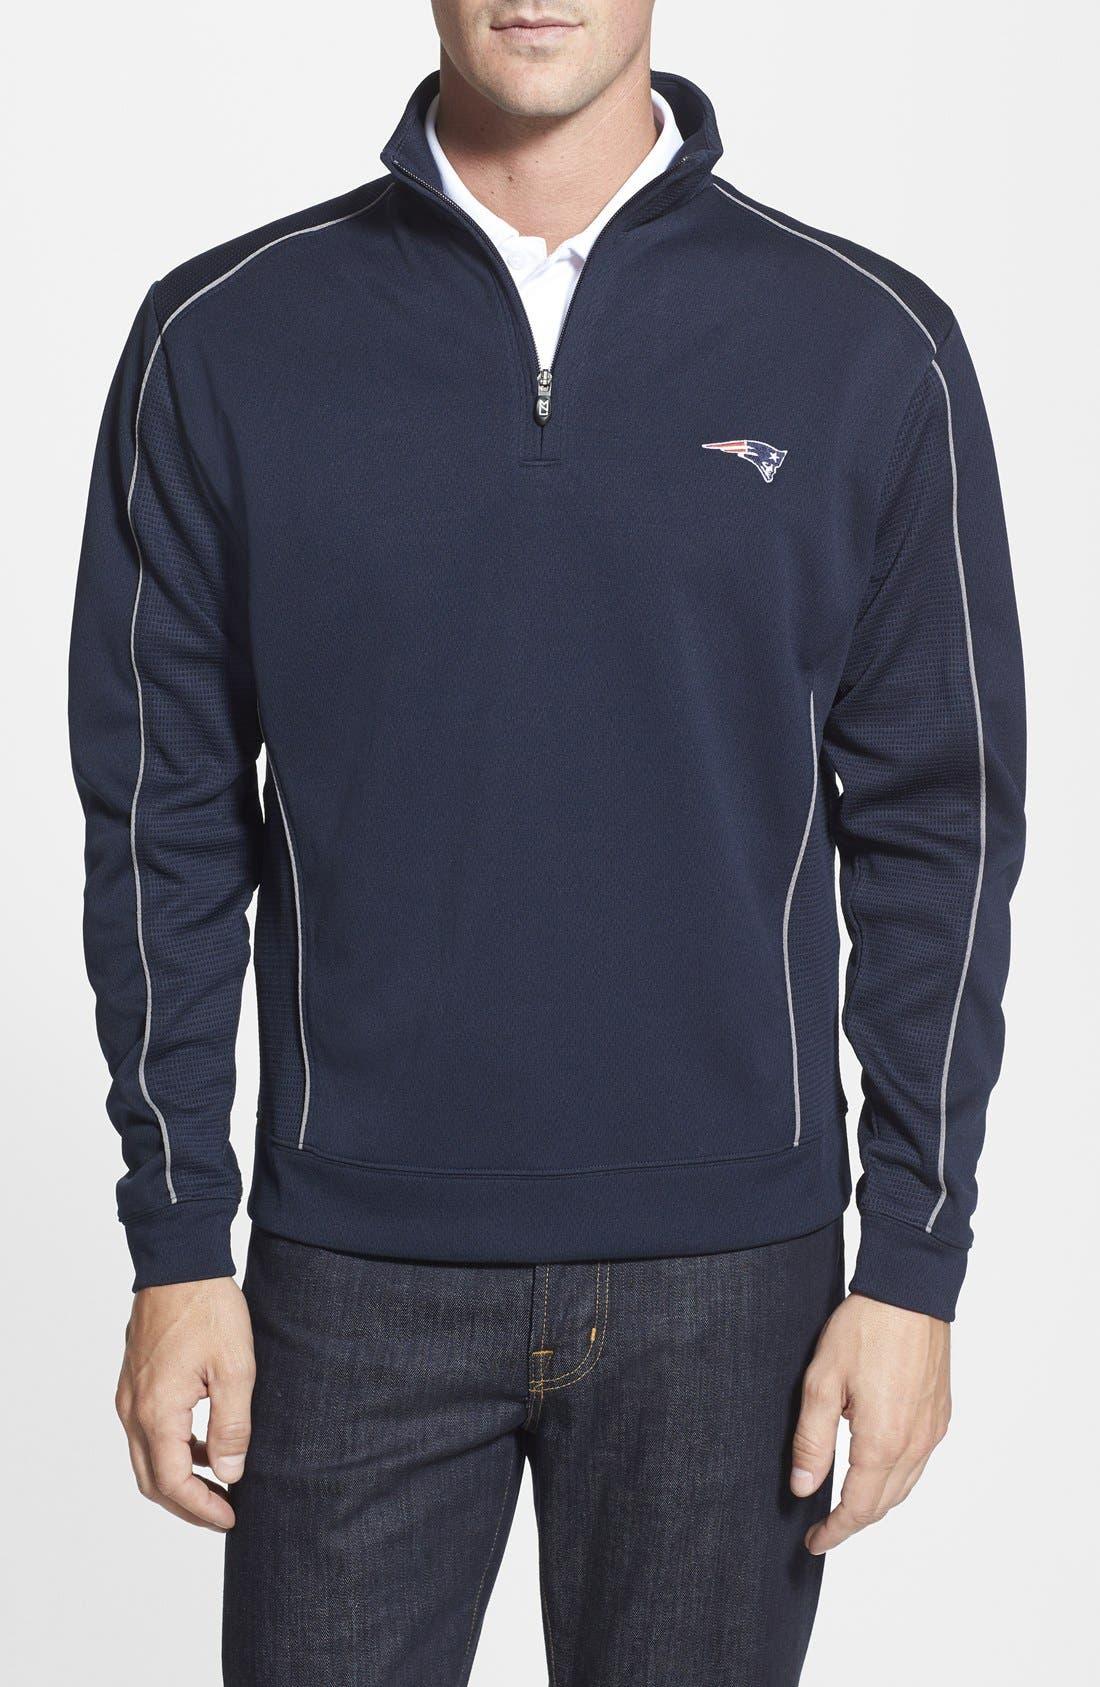 New England Patriots - Edge DryTec Moisture Wicking Half Zip Pullover,                             Main thumbnail 1, color,                             420